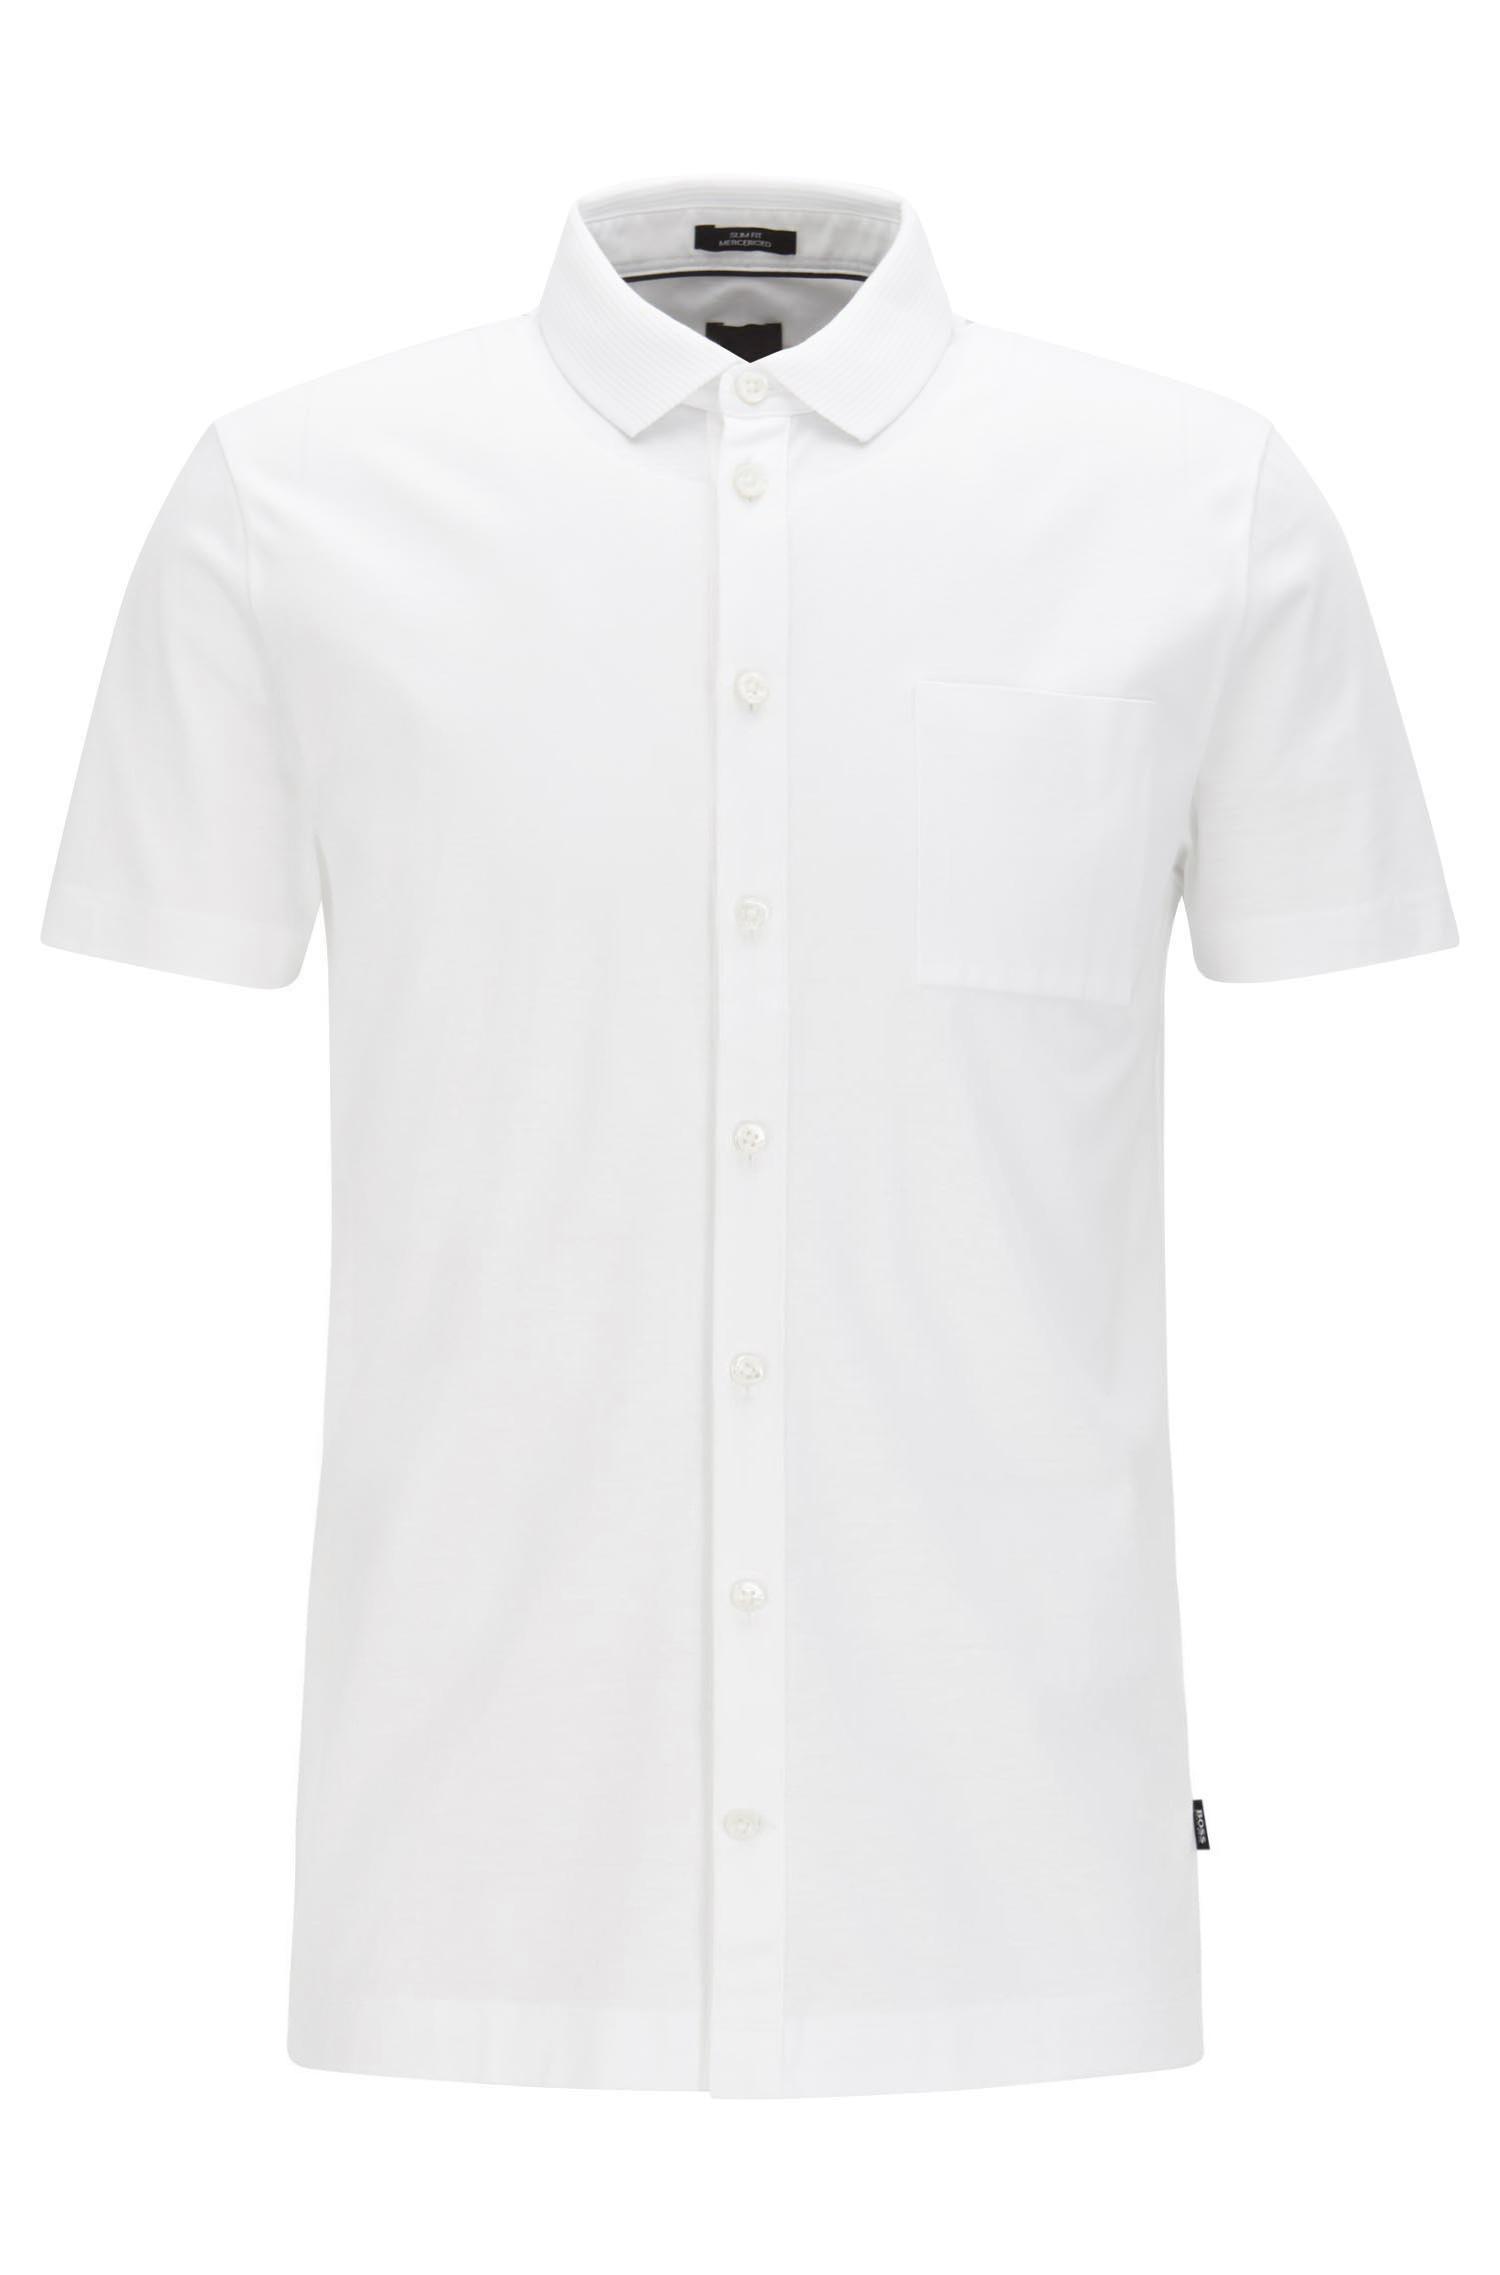 0e8349ba8 Hugo Boss Polo Shirts House Of Fraser | RLDM